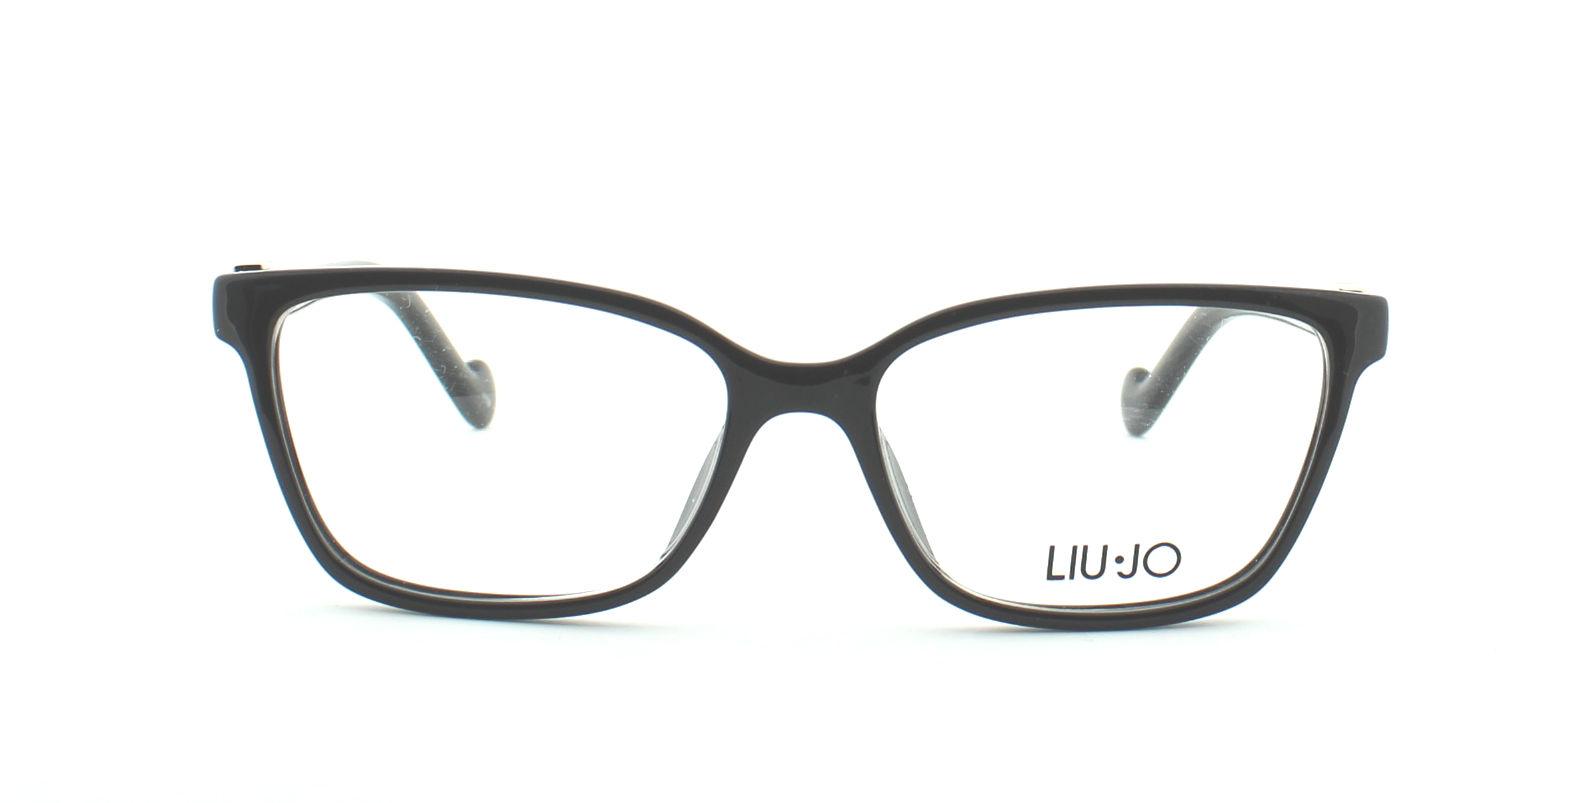 LIU-JO model 2619 col.001